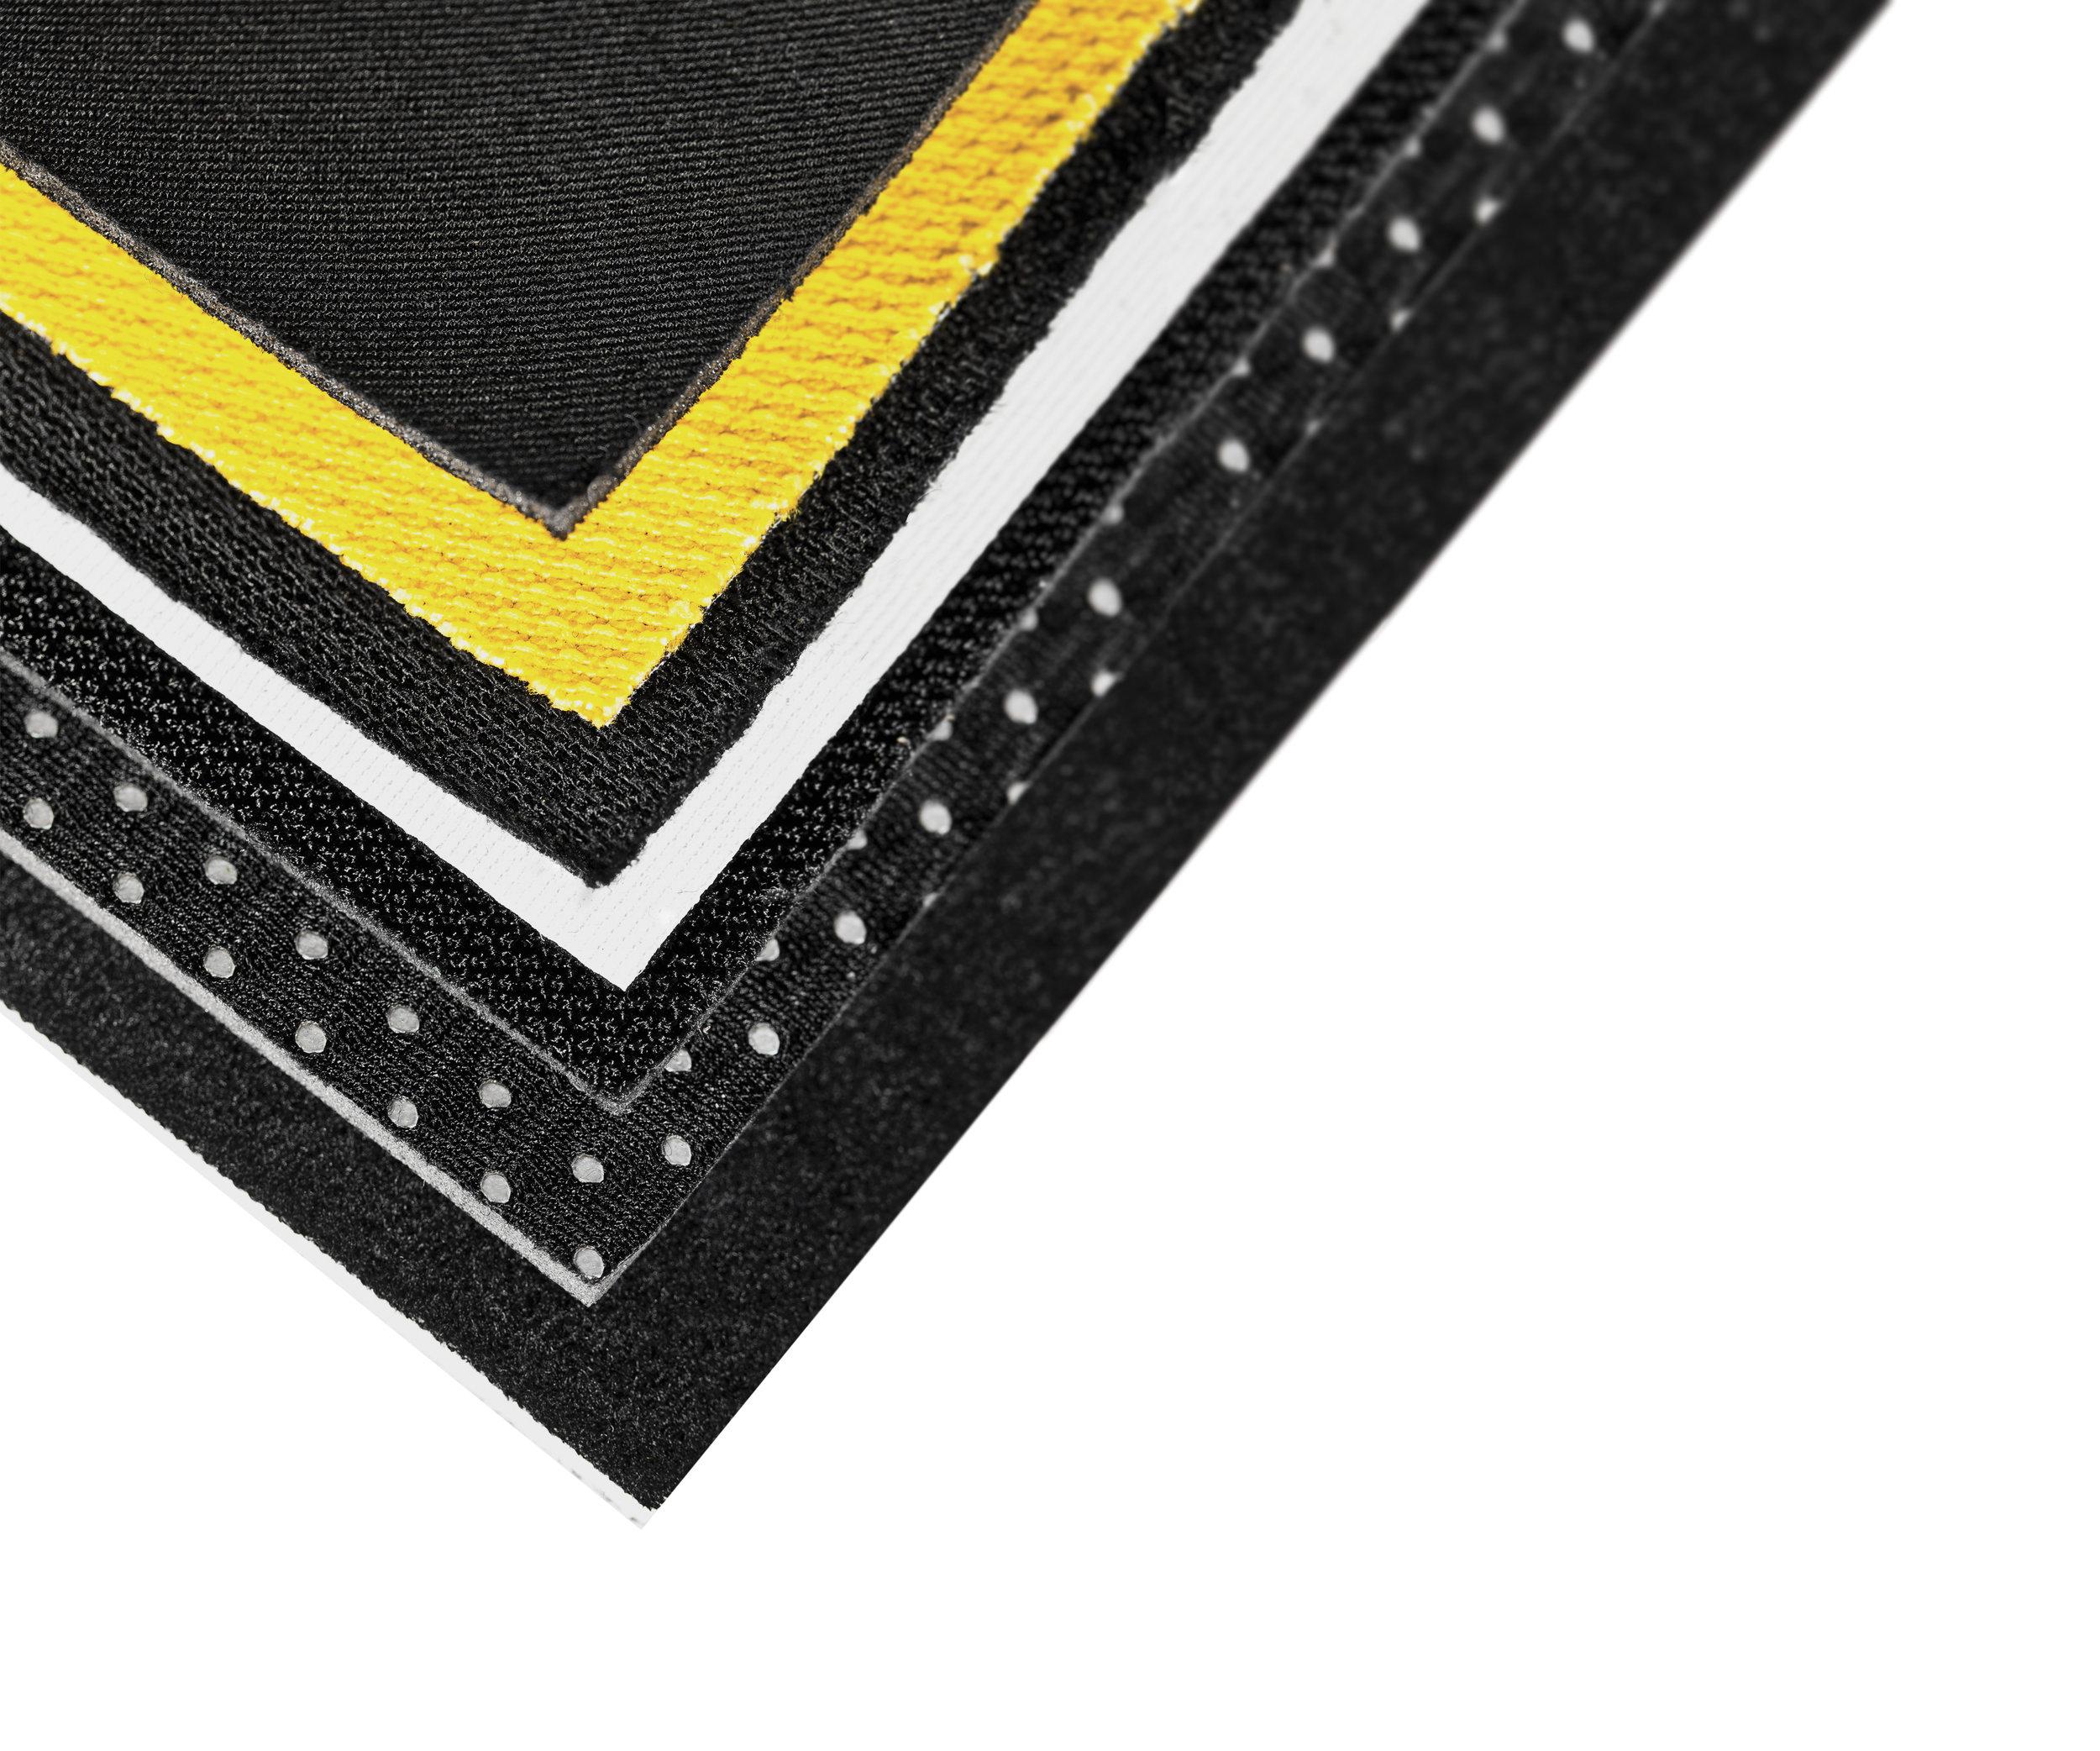 G2 SM black-yellow (11QBY) strati scarpone.jpg